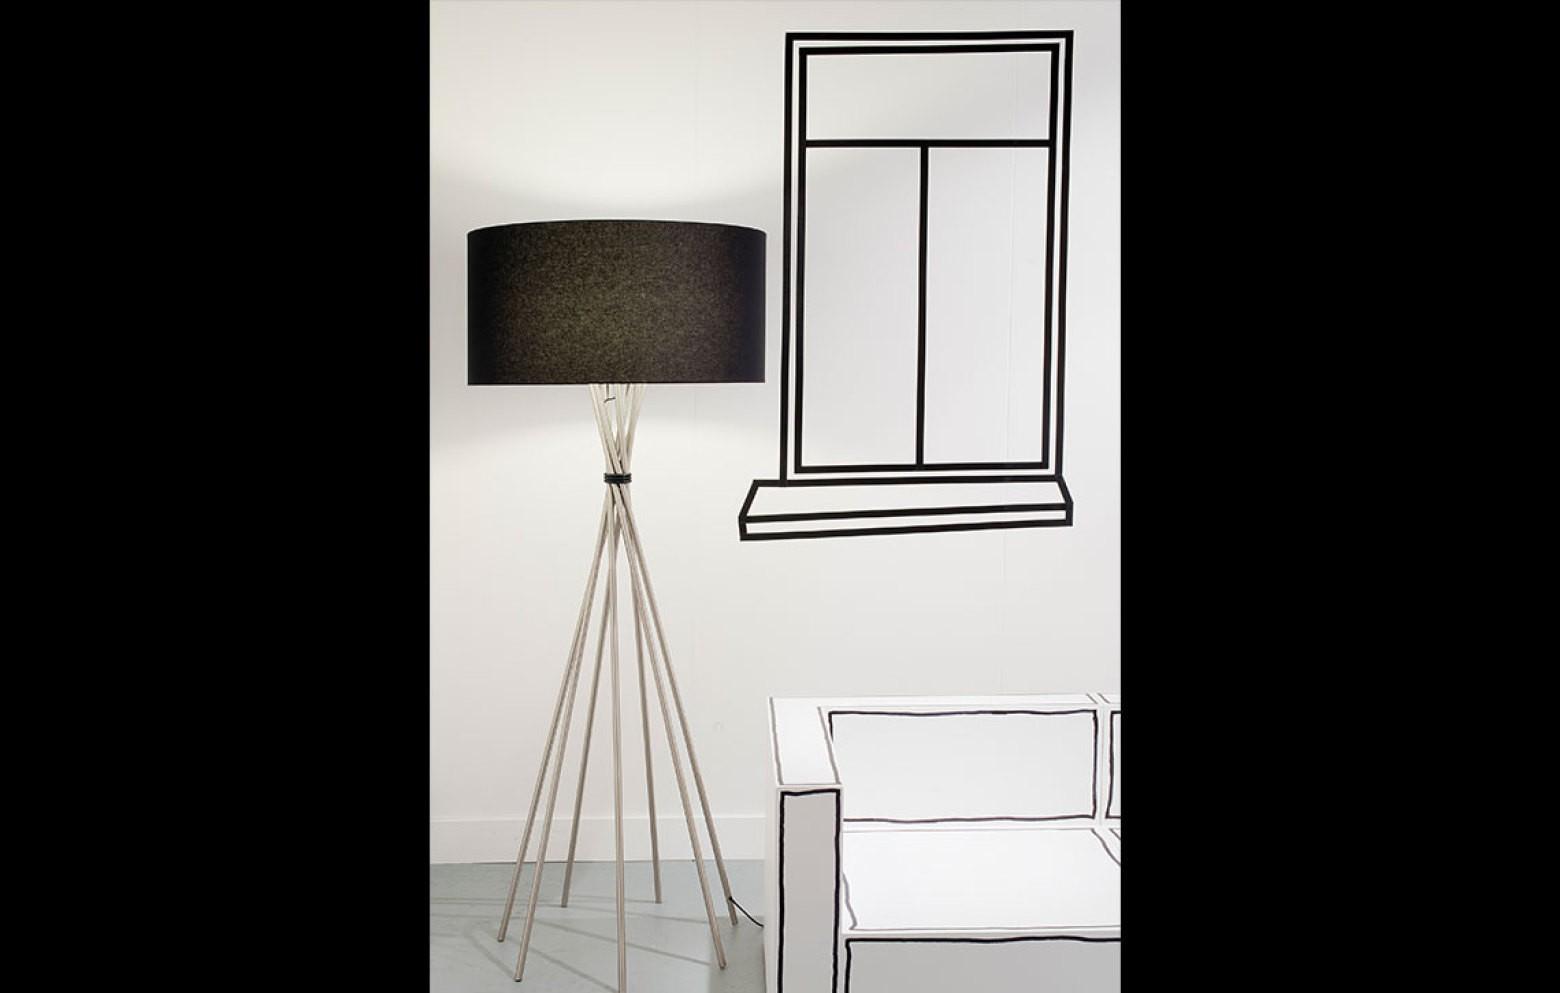 lima xl stehleuchte lampen kleinm bel accessoires who 39 s perfect. Black Bedroom Furniture Sets. Home Design Ideas